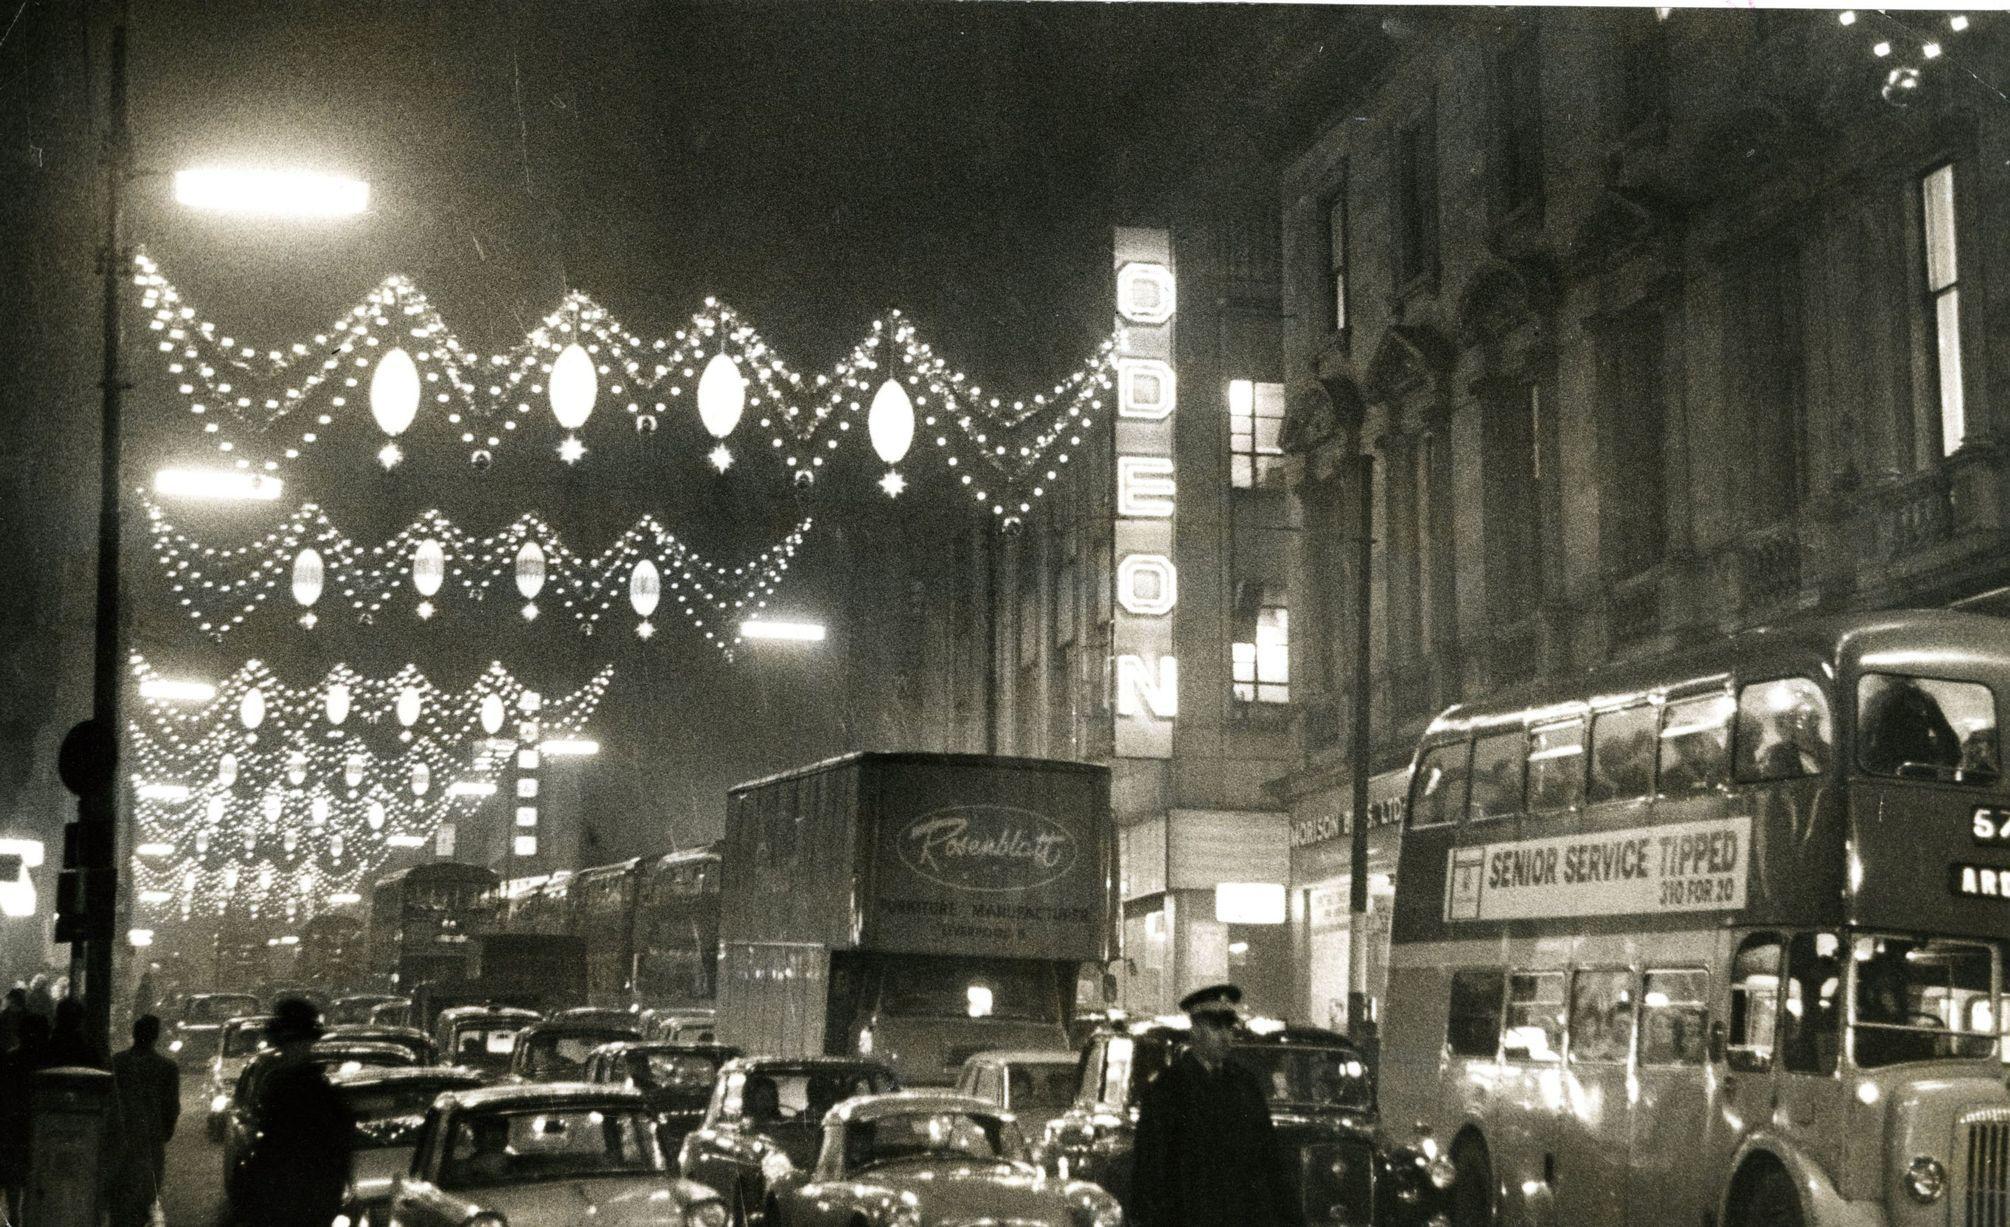 Christmas Lights Outside The Odeon Cinema On Renfield Street 1964